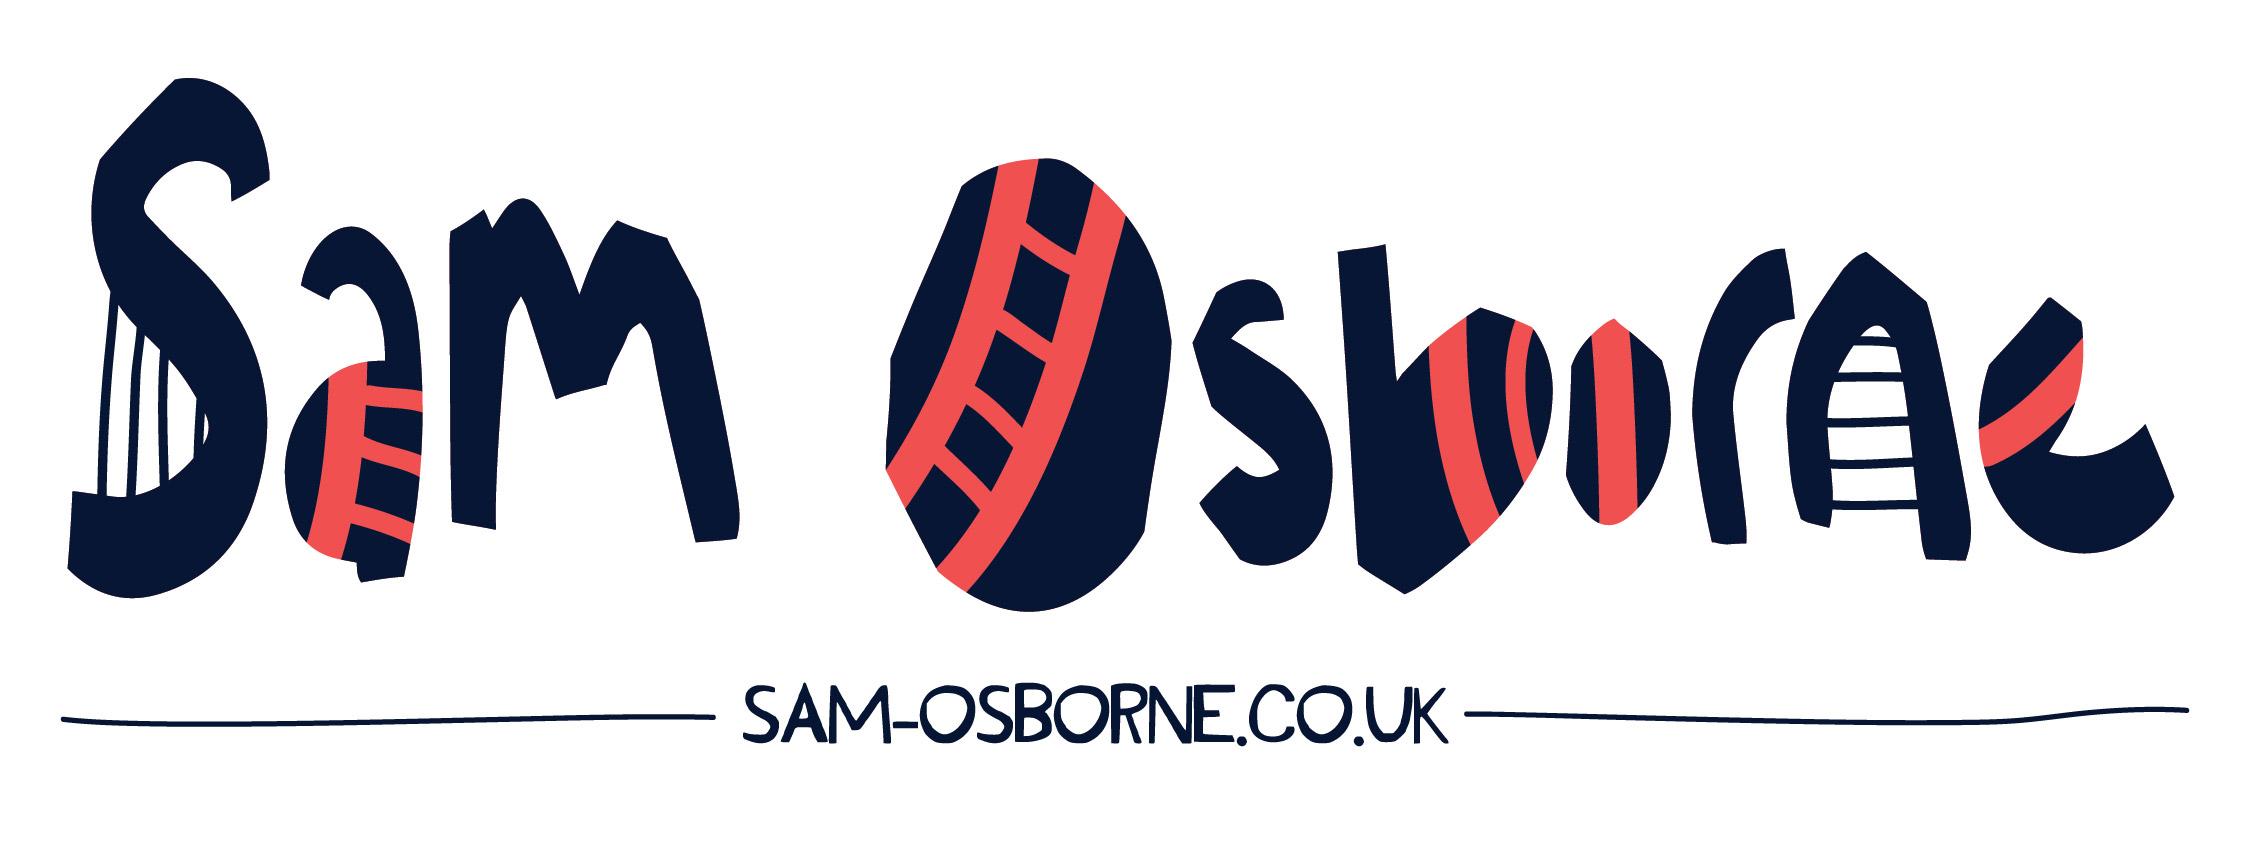 Sam Osborne Store Logo